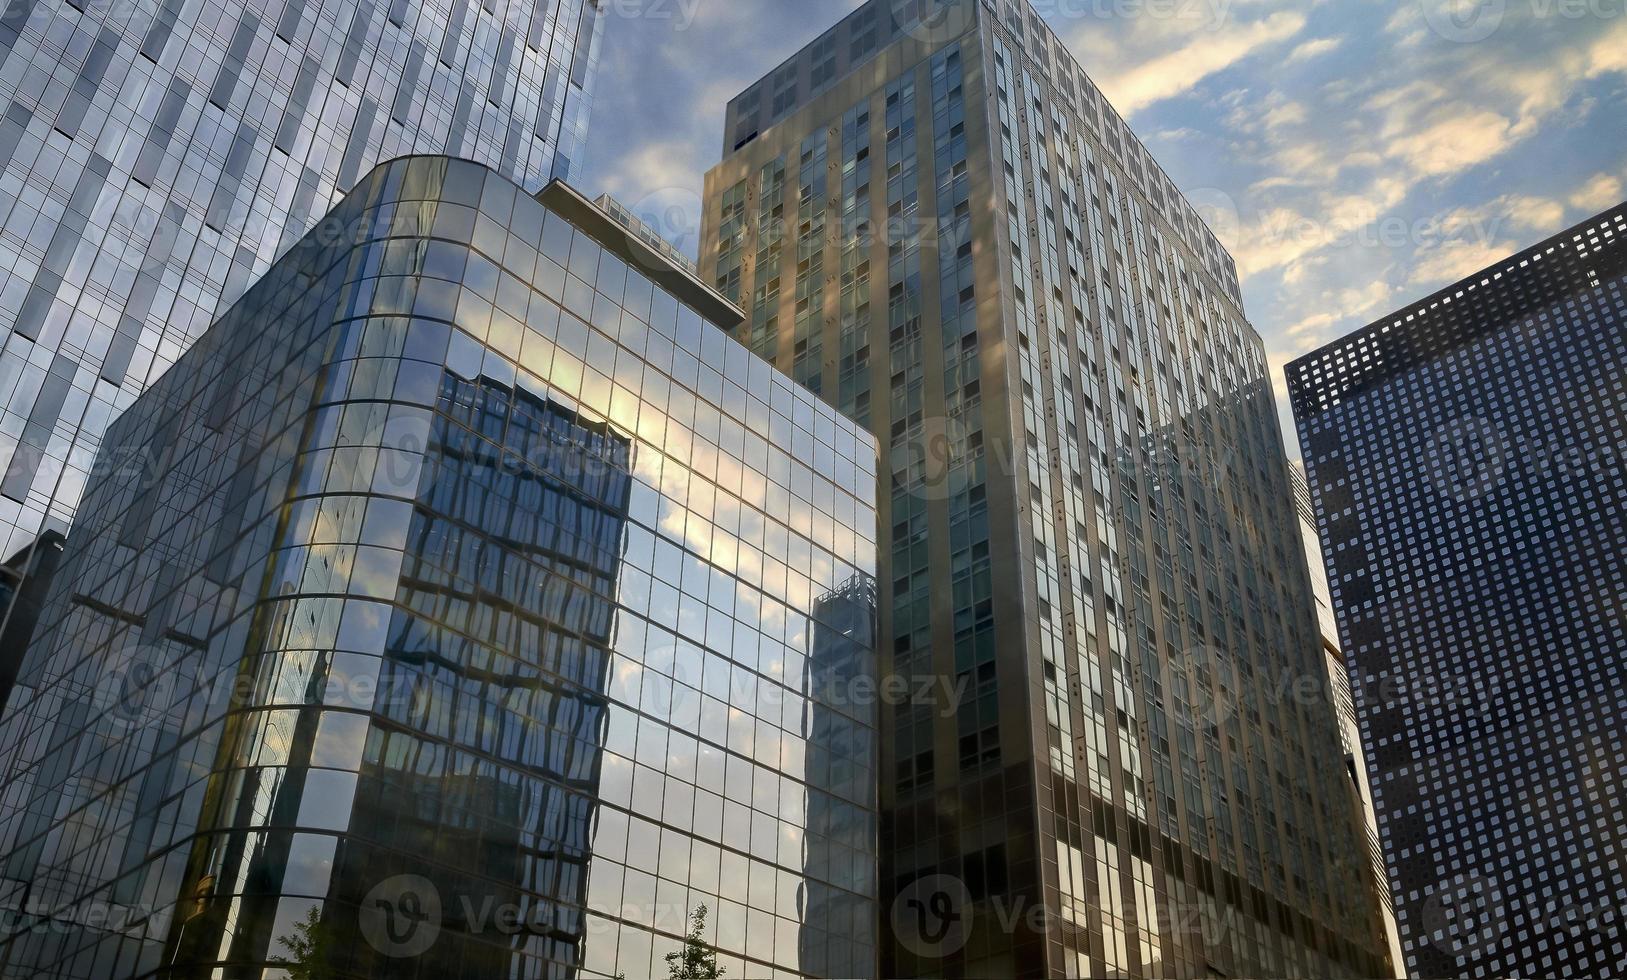 Stadtgeschäftsgebäude in Seoul, das den Himmel reflektiert - foto